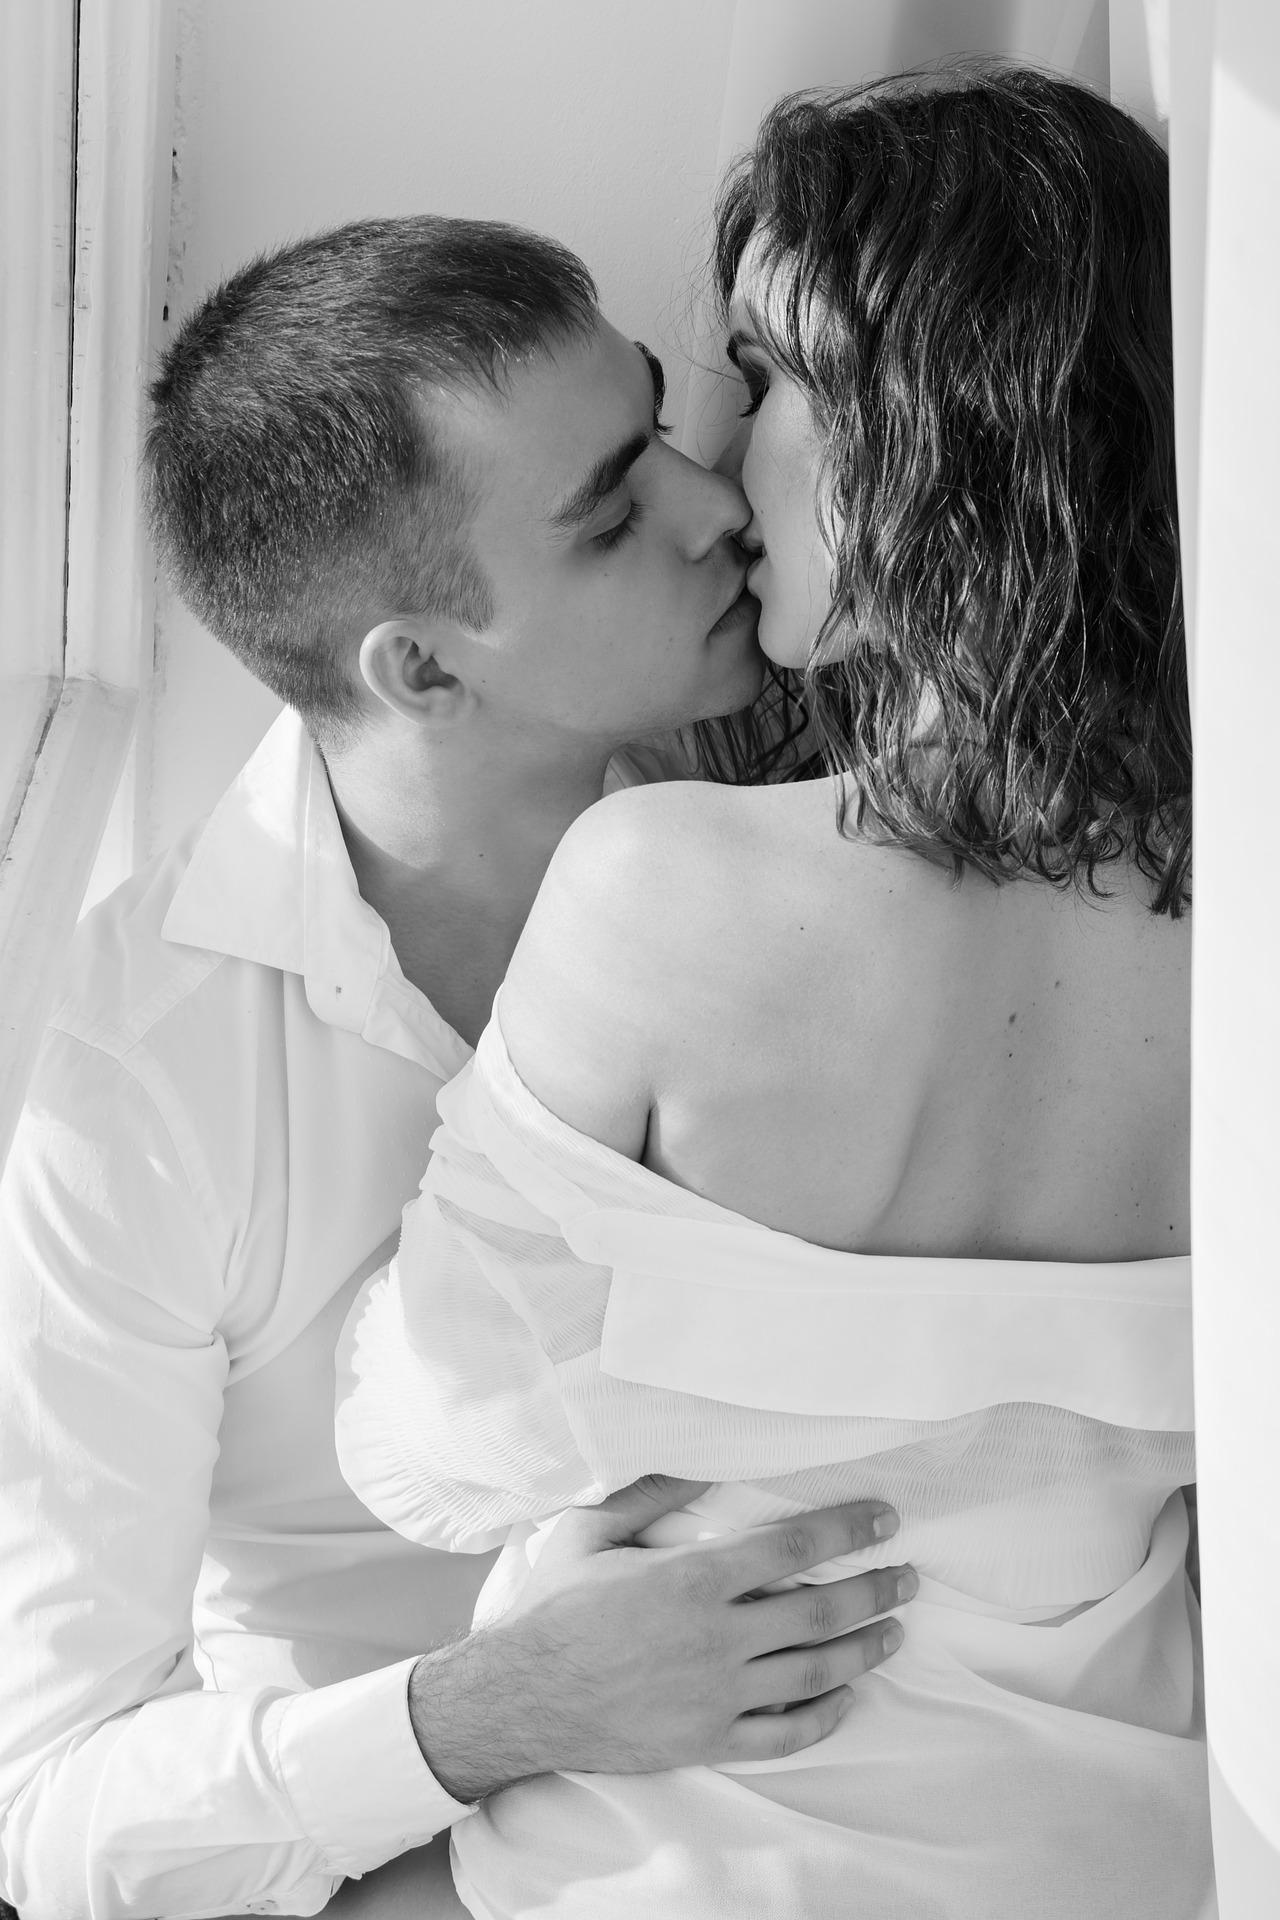 kiss-1858088_1920